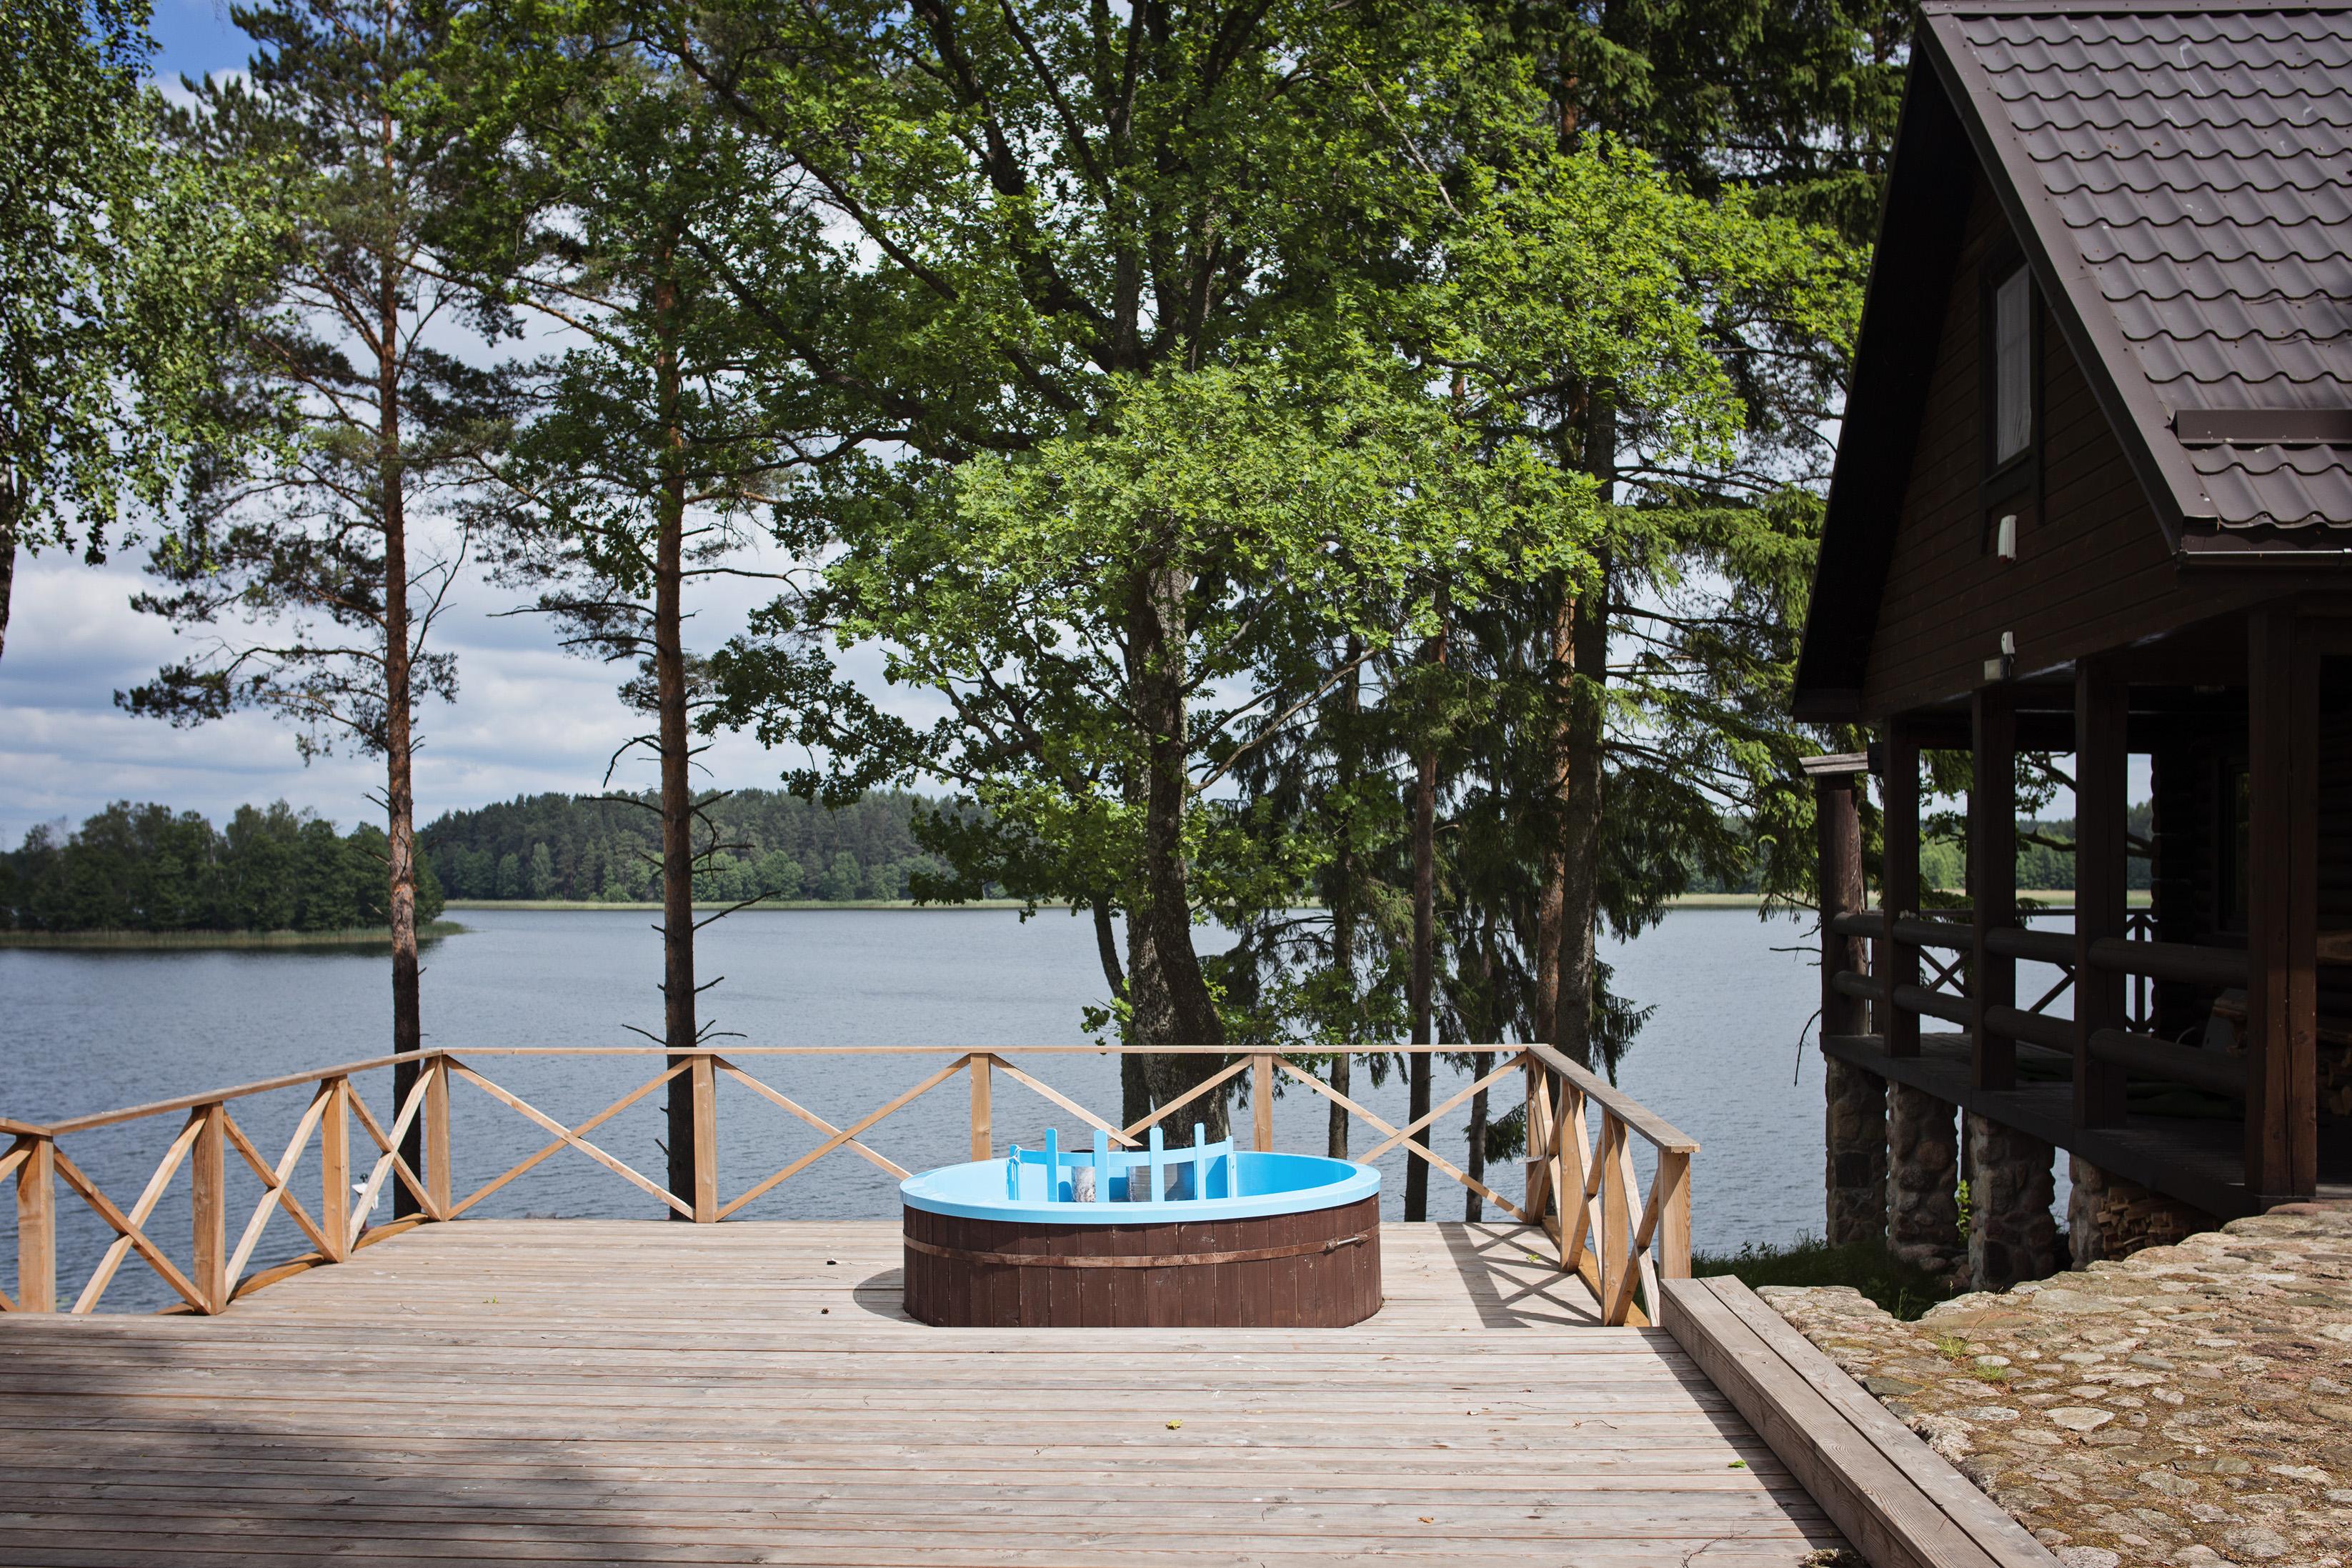 Kubilo nuoma prie ezero